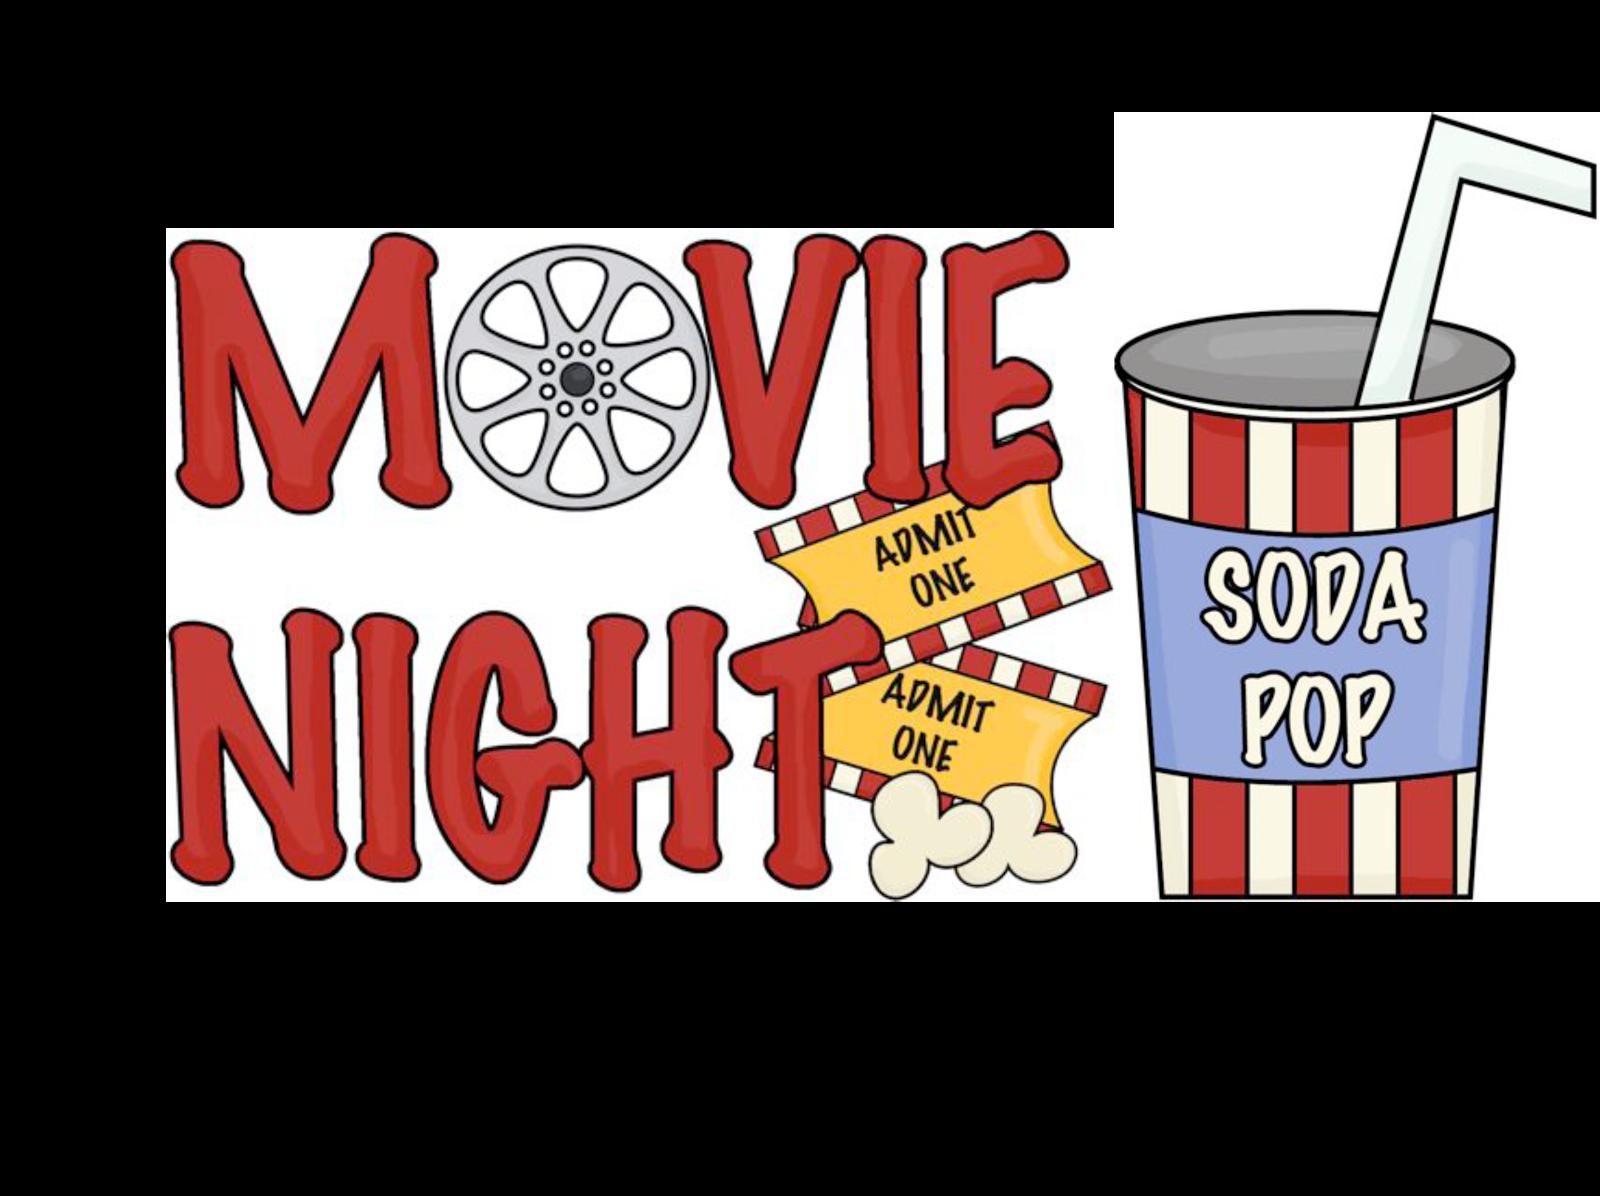 Movie clipart 2